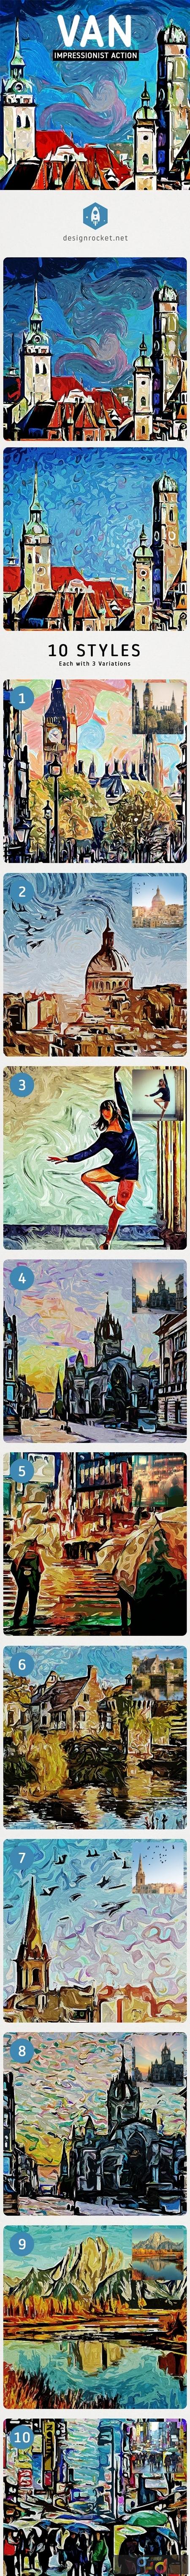 VAN - Impressionist Painting Action 24971875 1